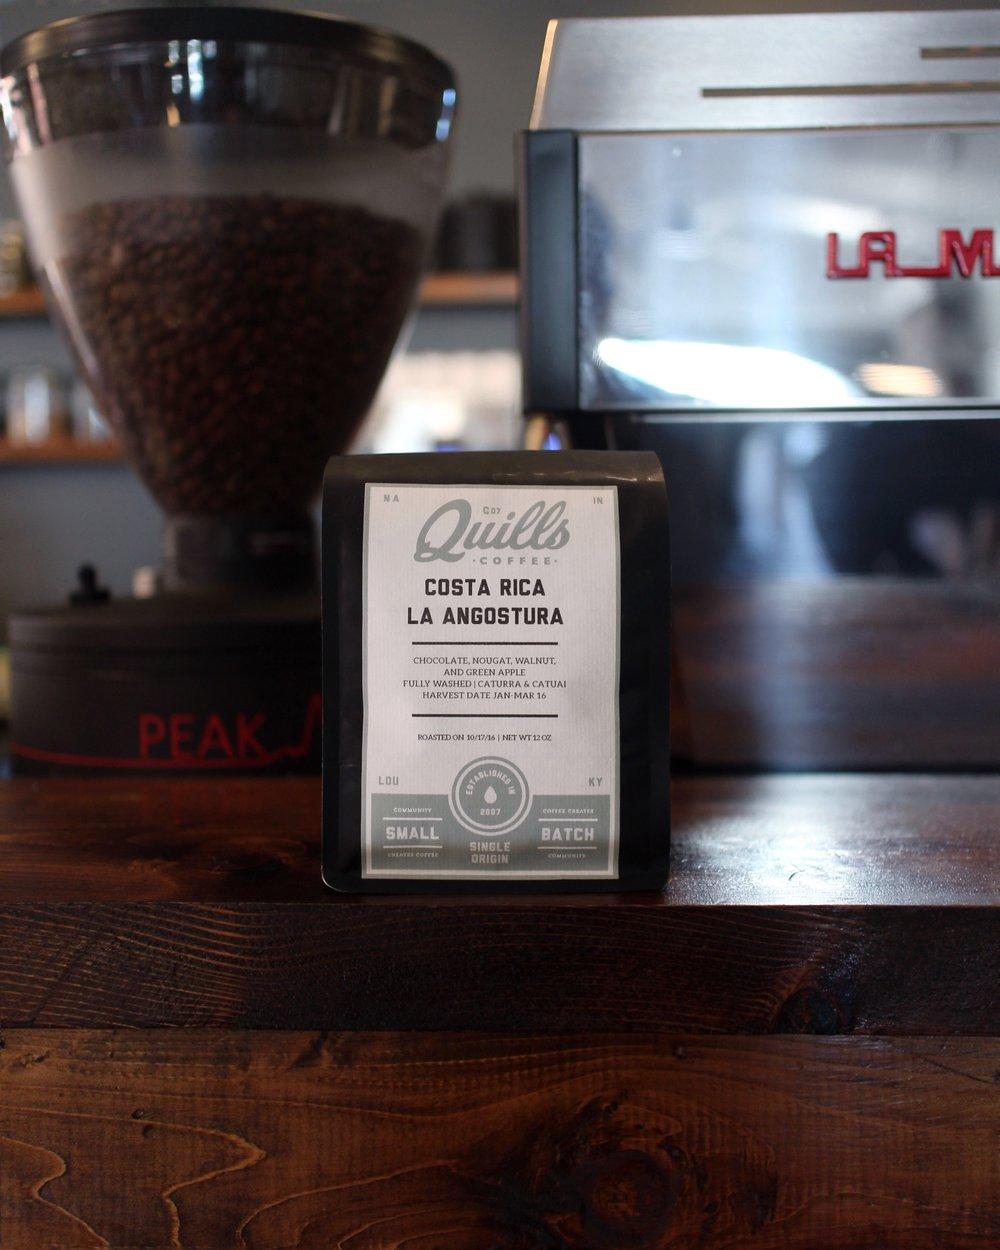 Costa-Rica-La-Angostura-Quills-Coffee.jpg